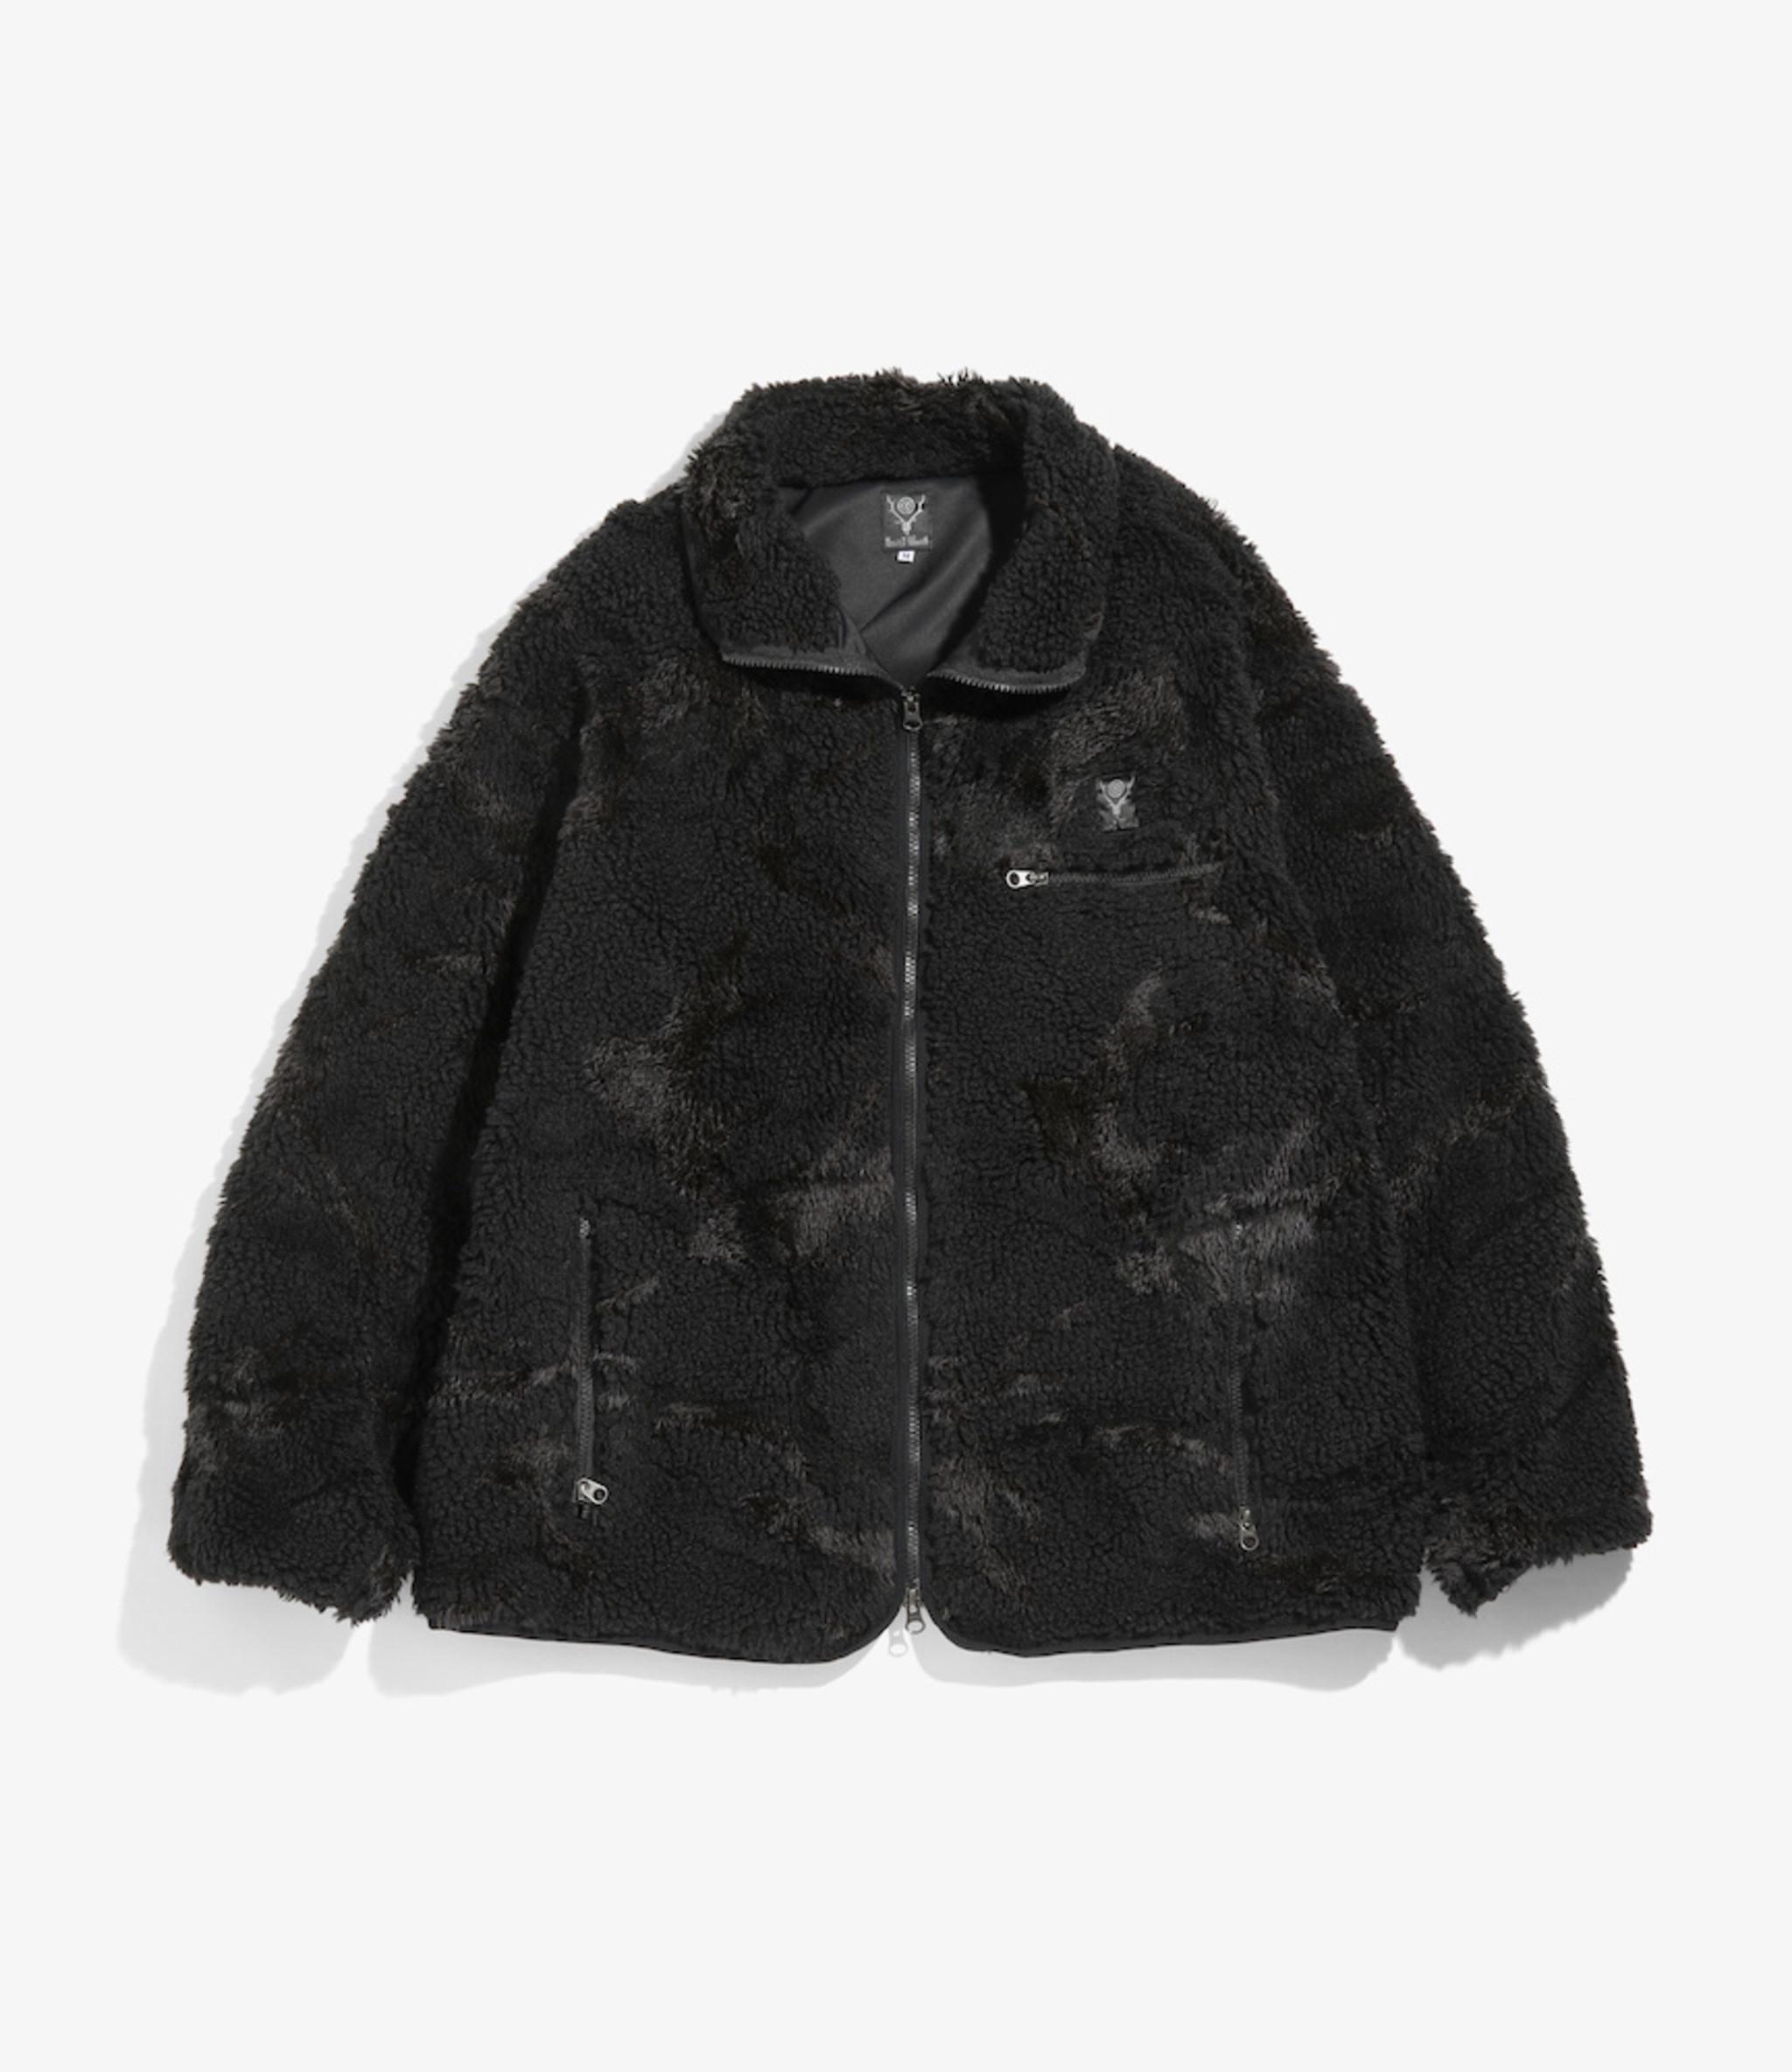 South2 West8 Piping Jacket - Boa Jq - Black